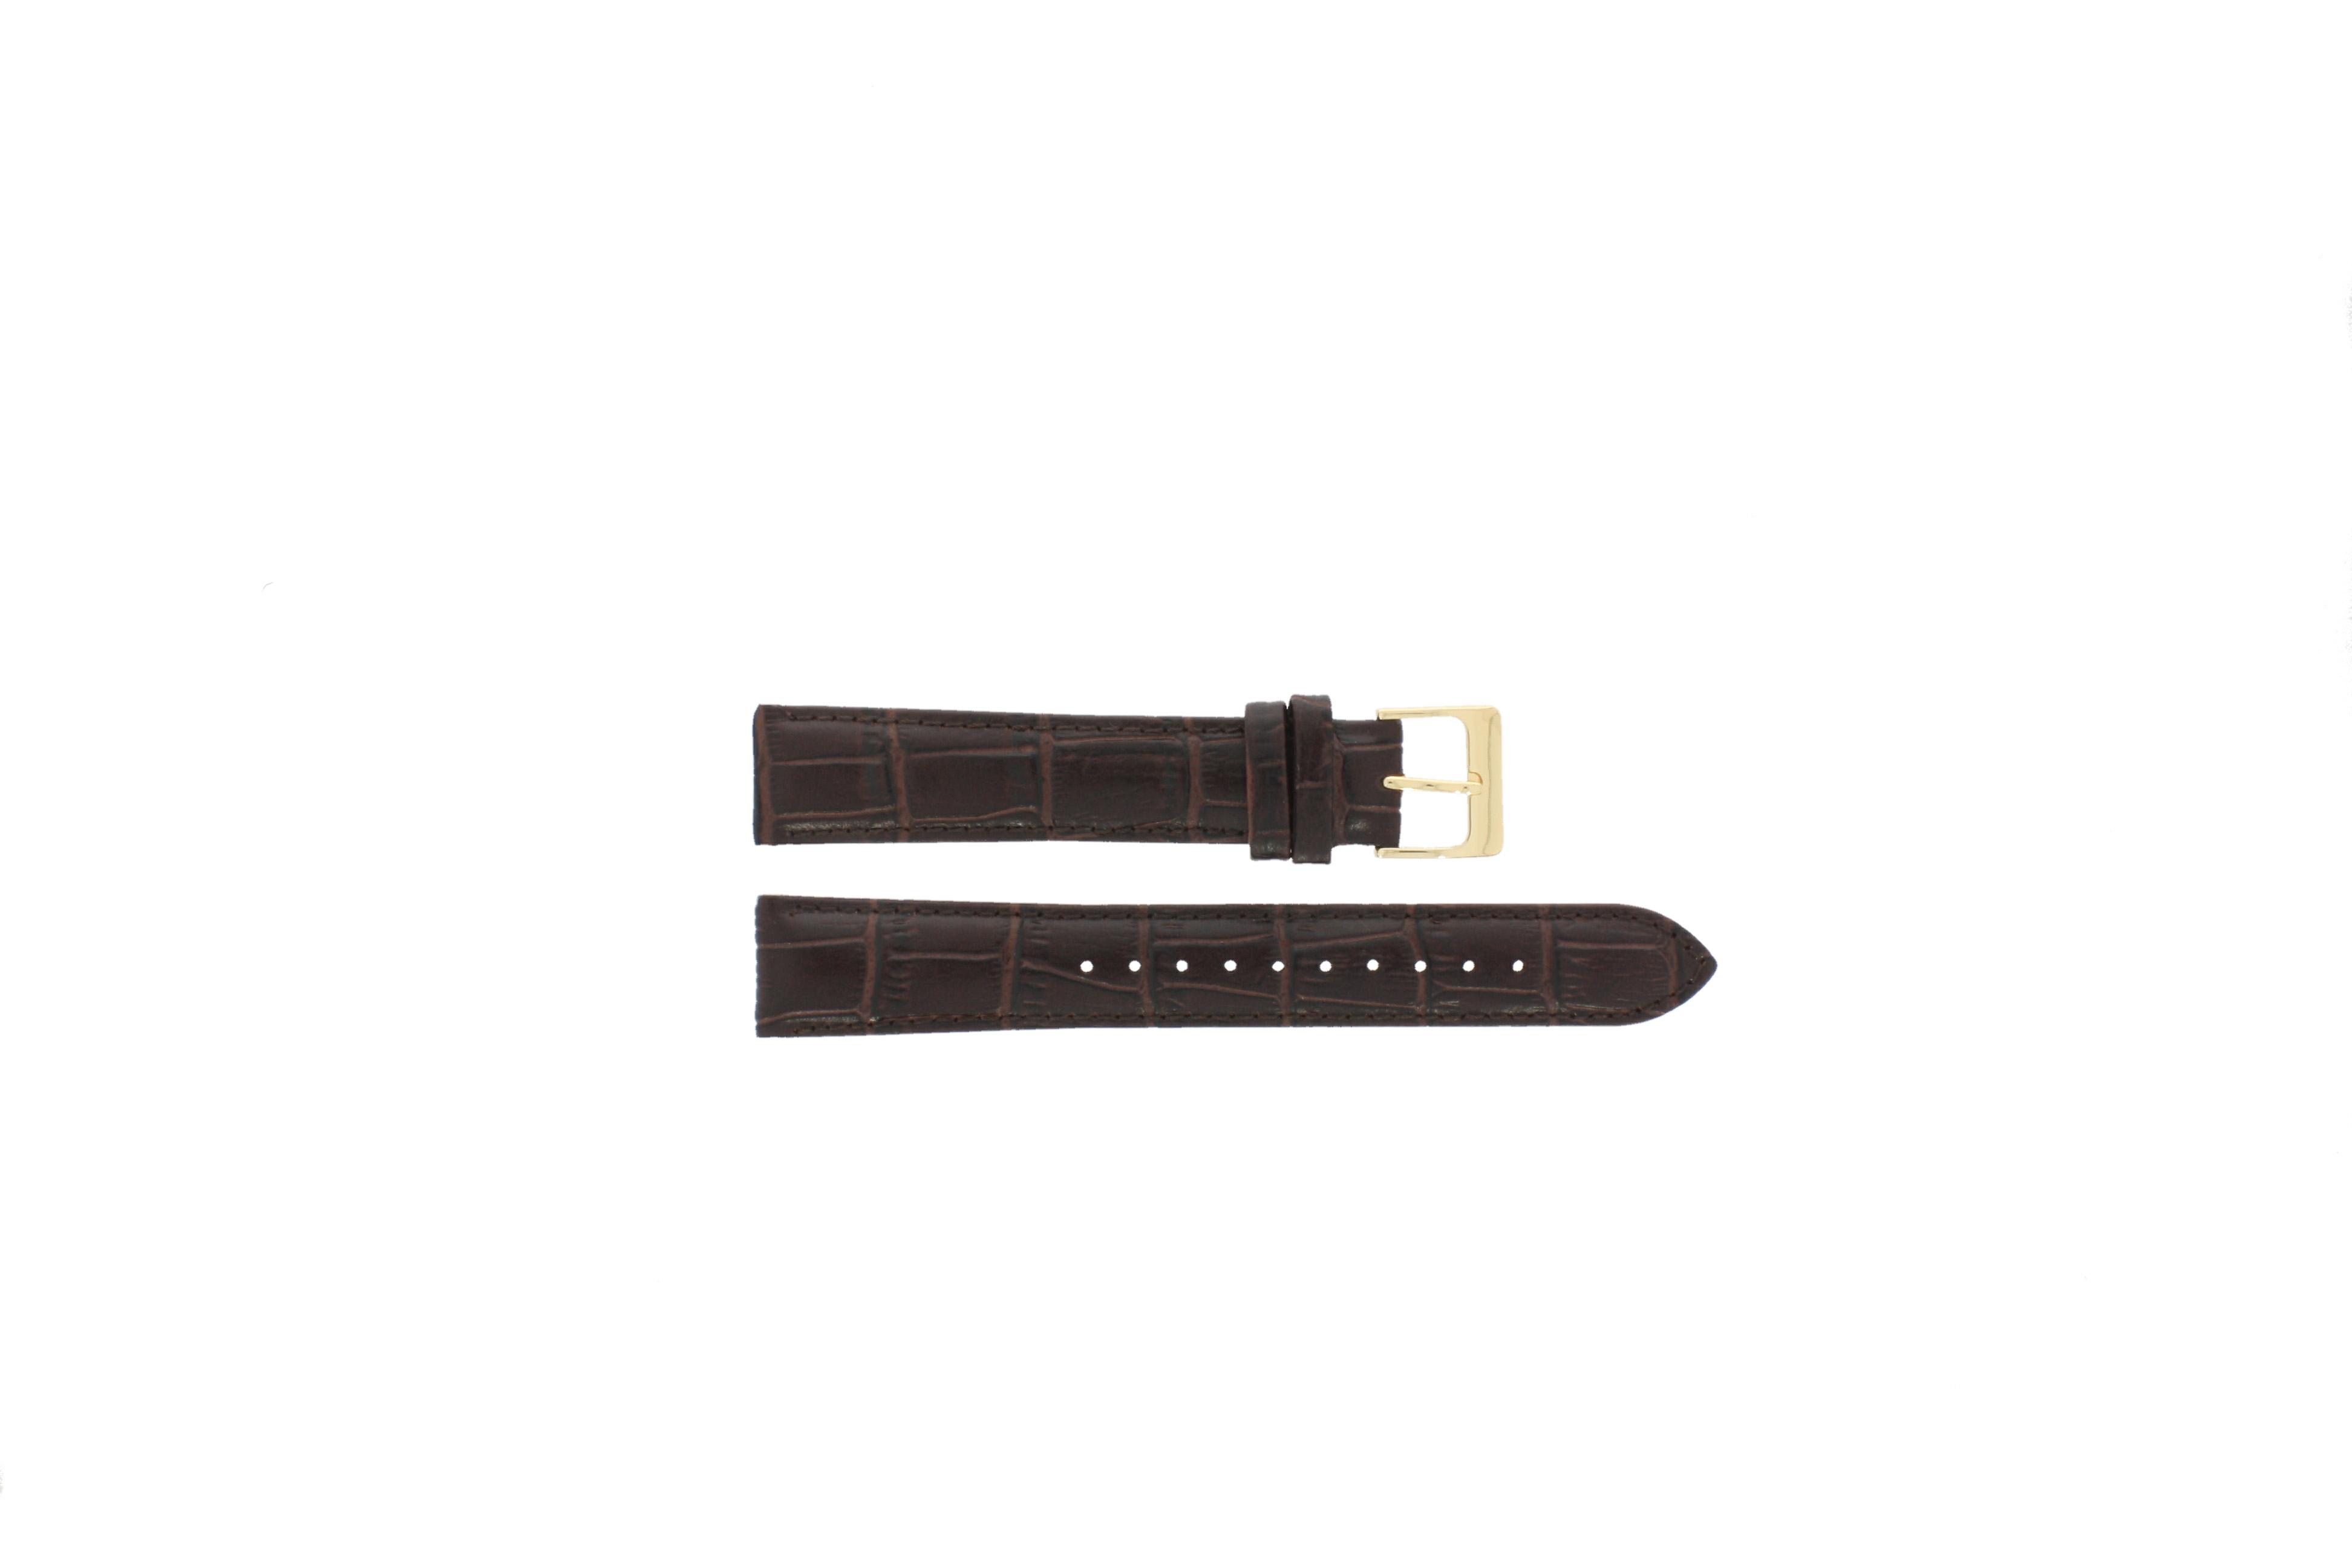 Lorus horlogeband VX32-X383 Leder Bruin 18mm